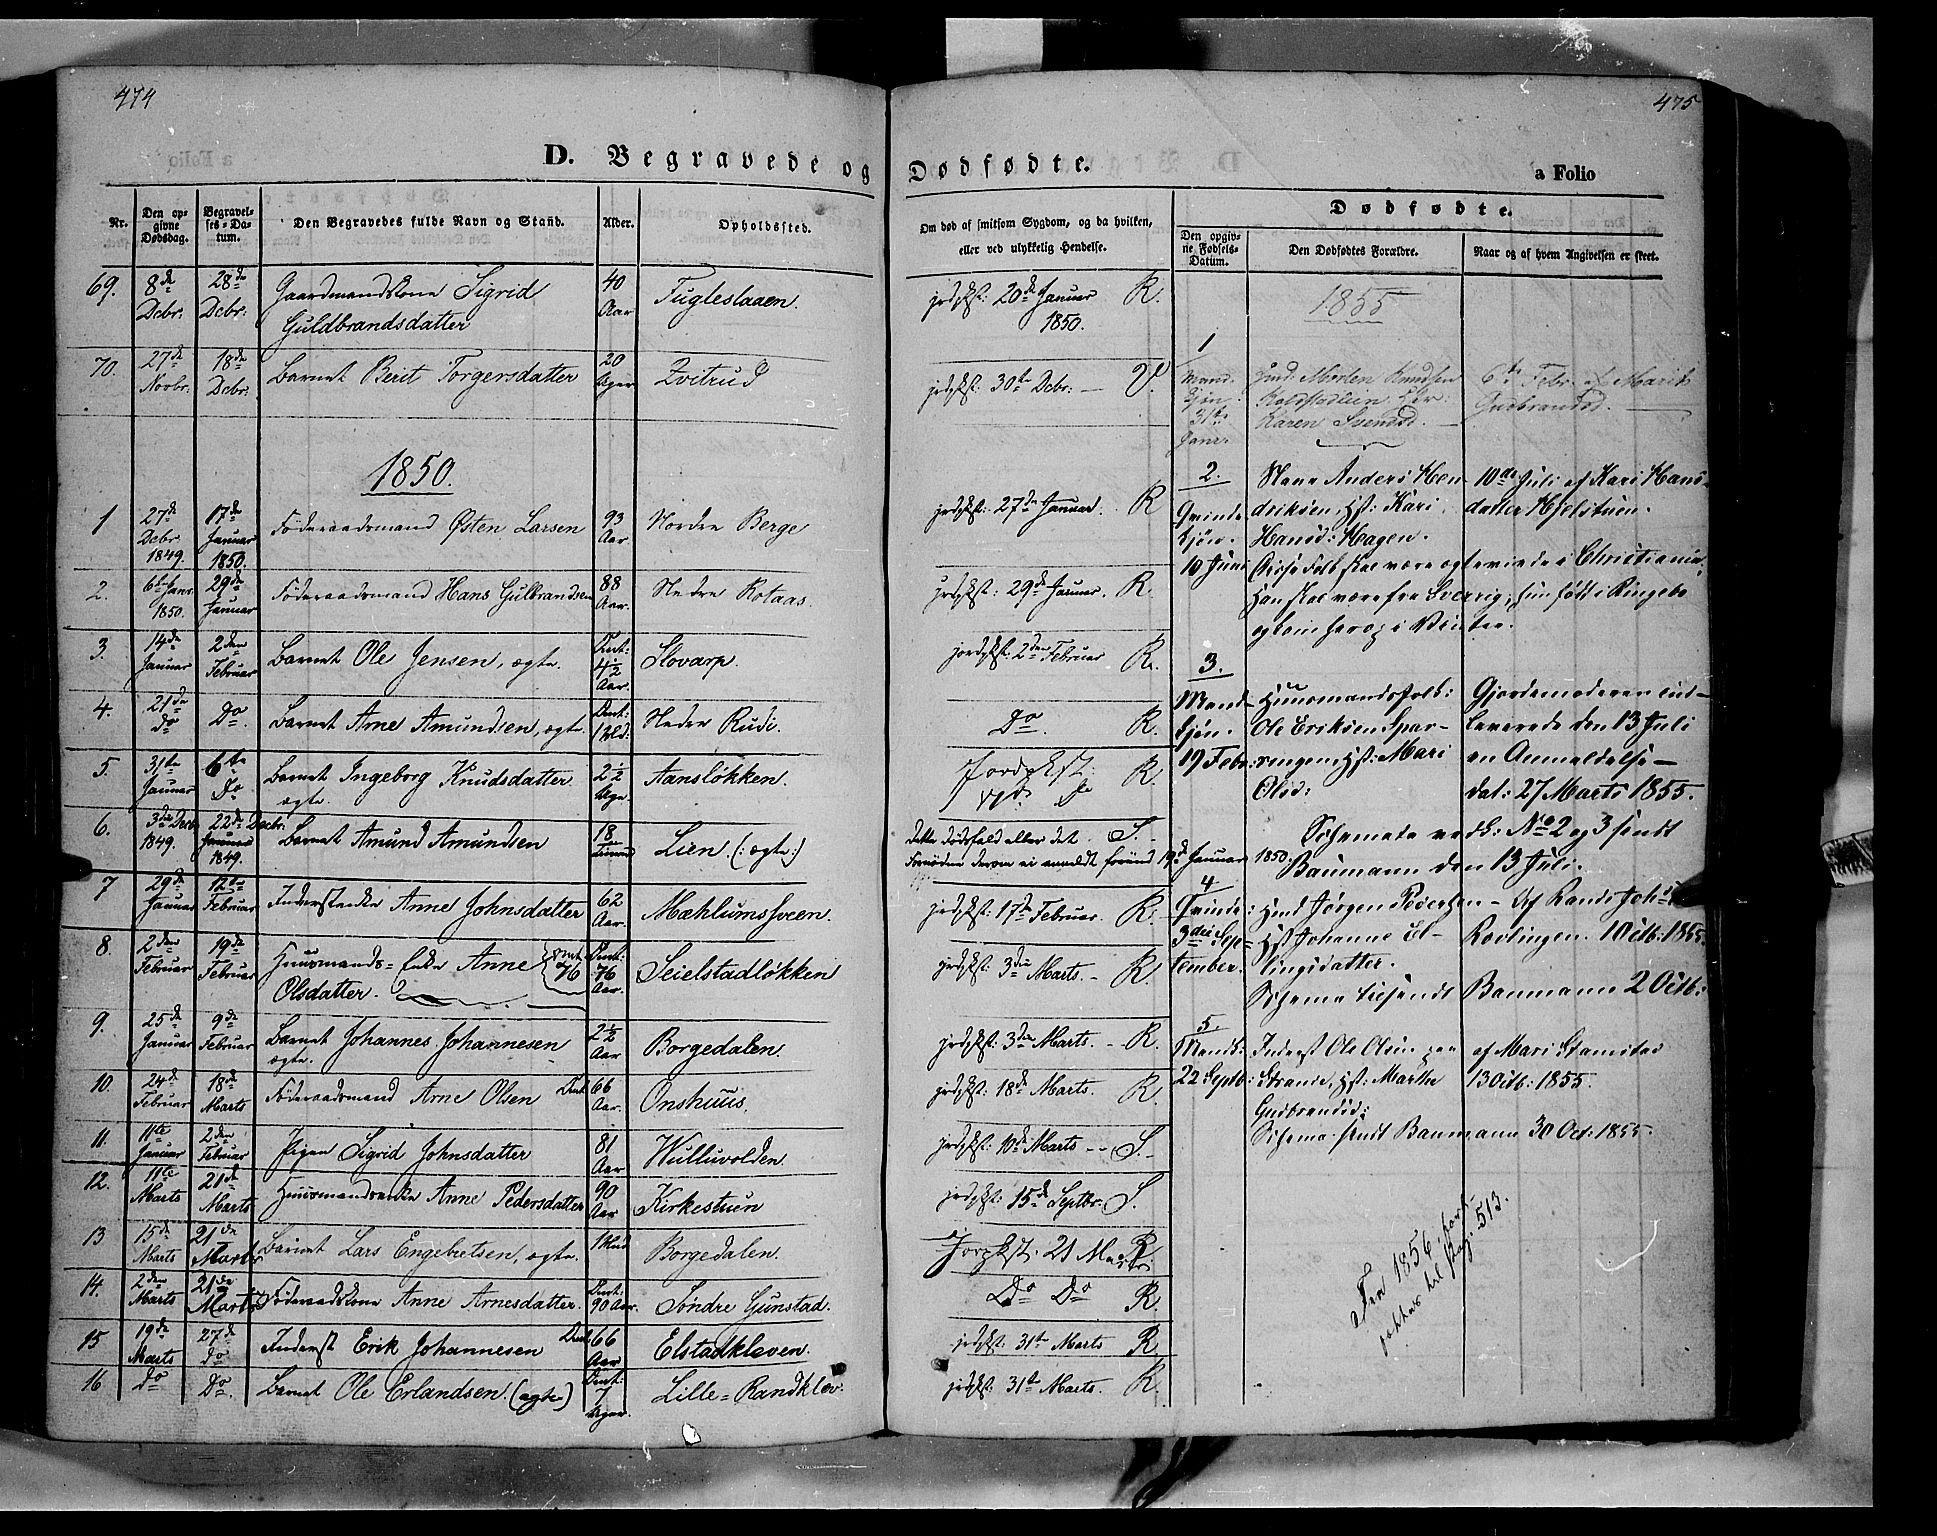 SAH, Ringebu prestekontor, Ministerialbok nr. 6, 1848-1859, s. 474-475